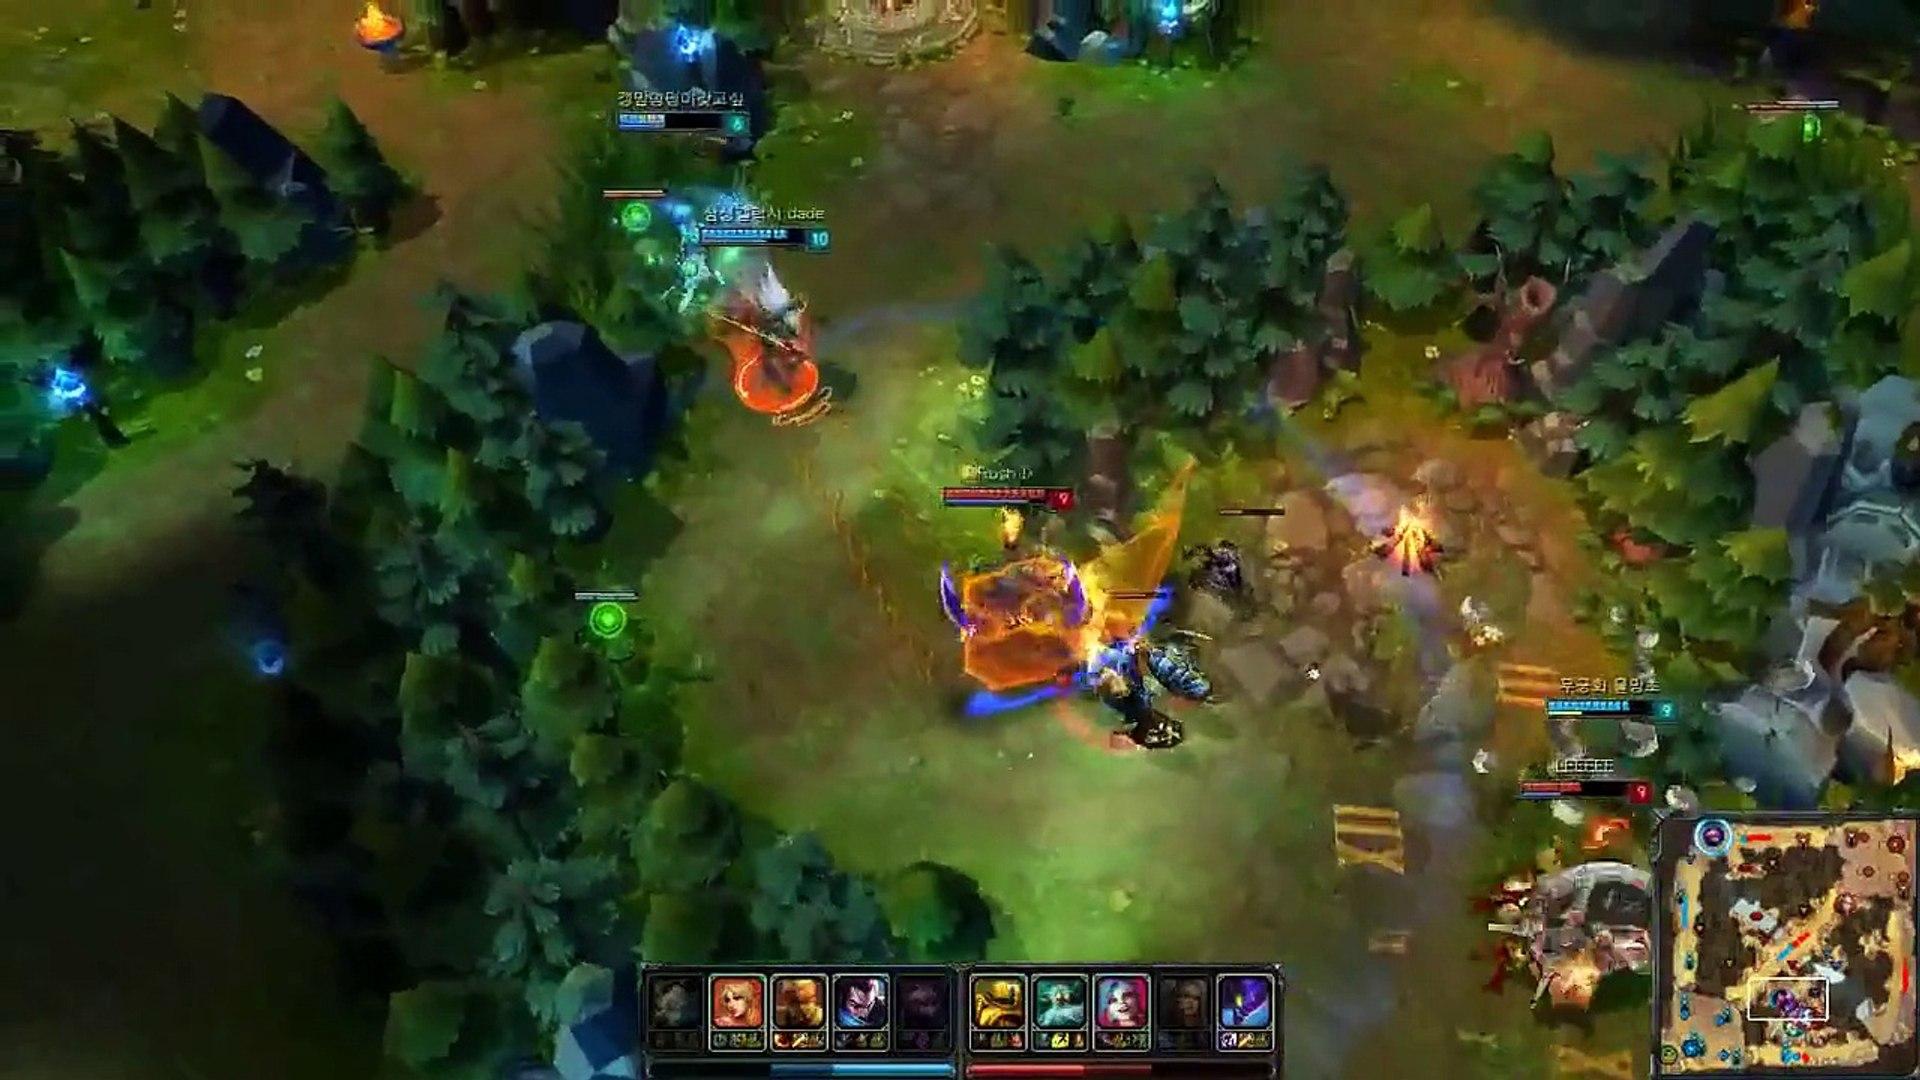 LOL Pro - Dade (Yasuo vs Zilean) - Korea SoloQ (Highlights)